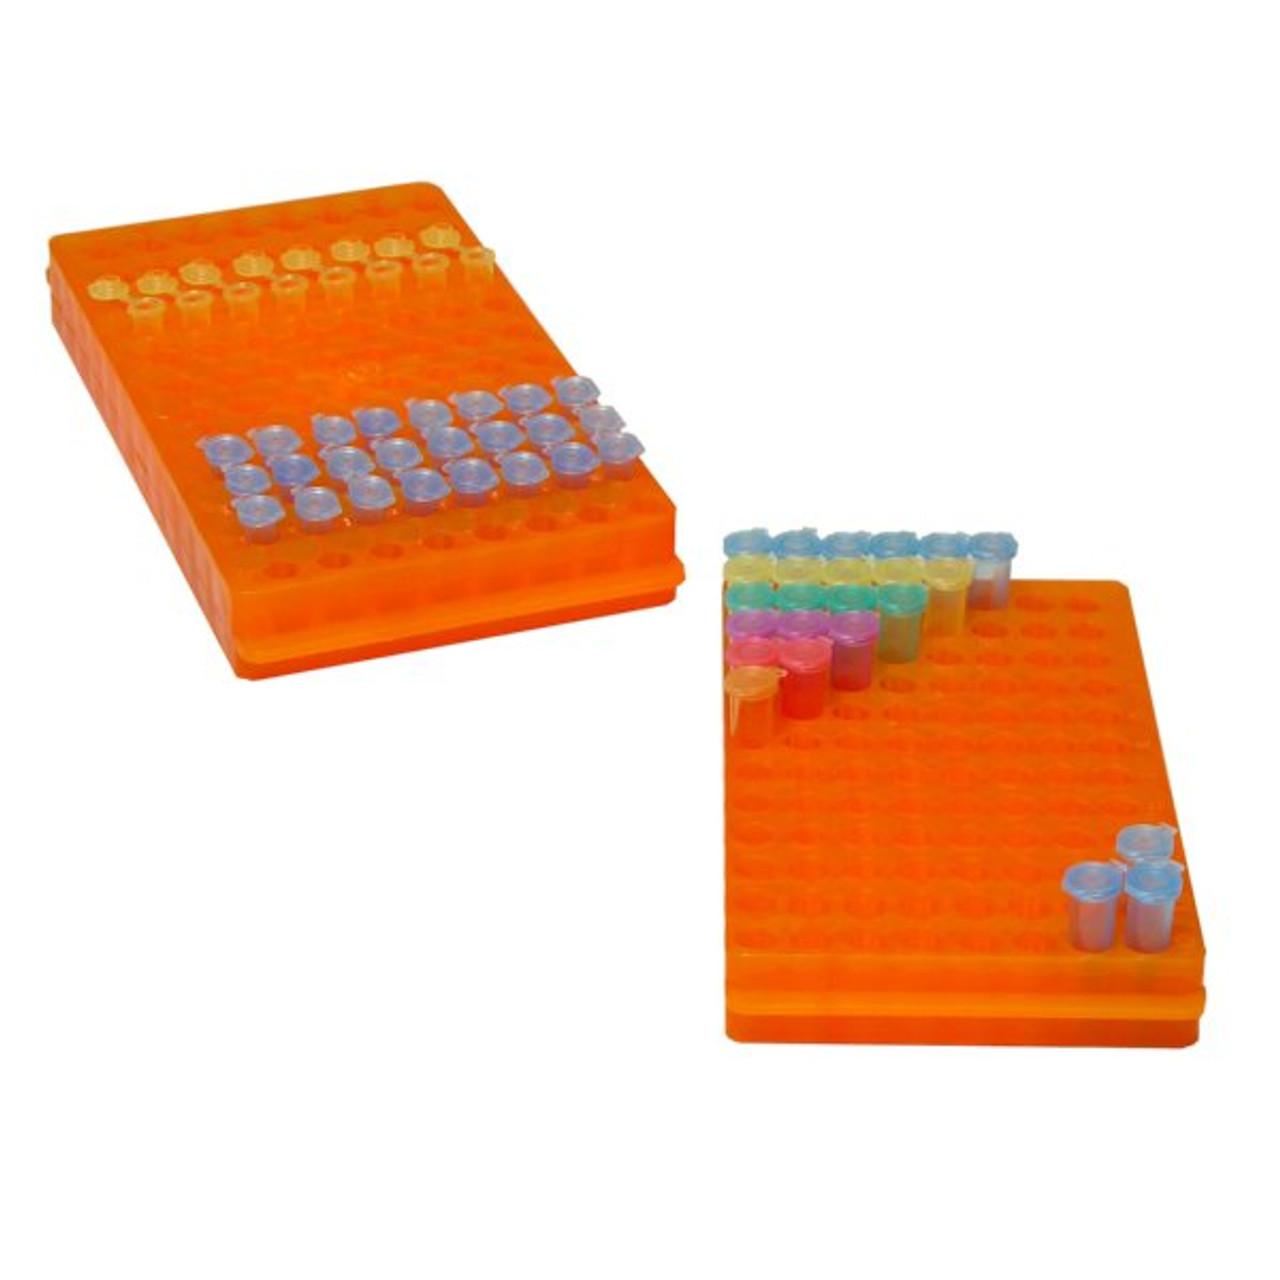 5pk Orange Hinged CryoBox